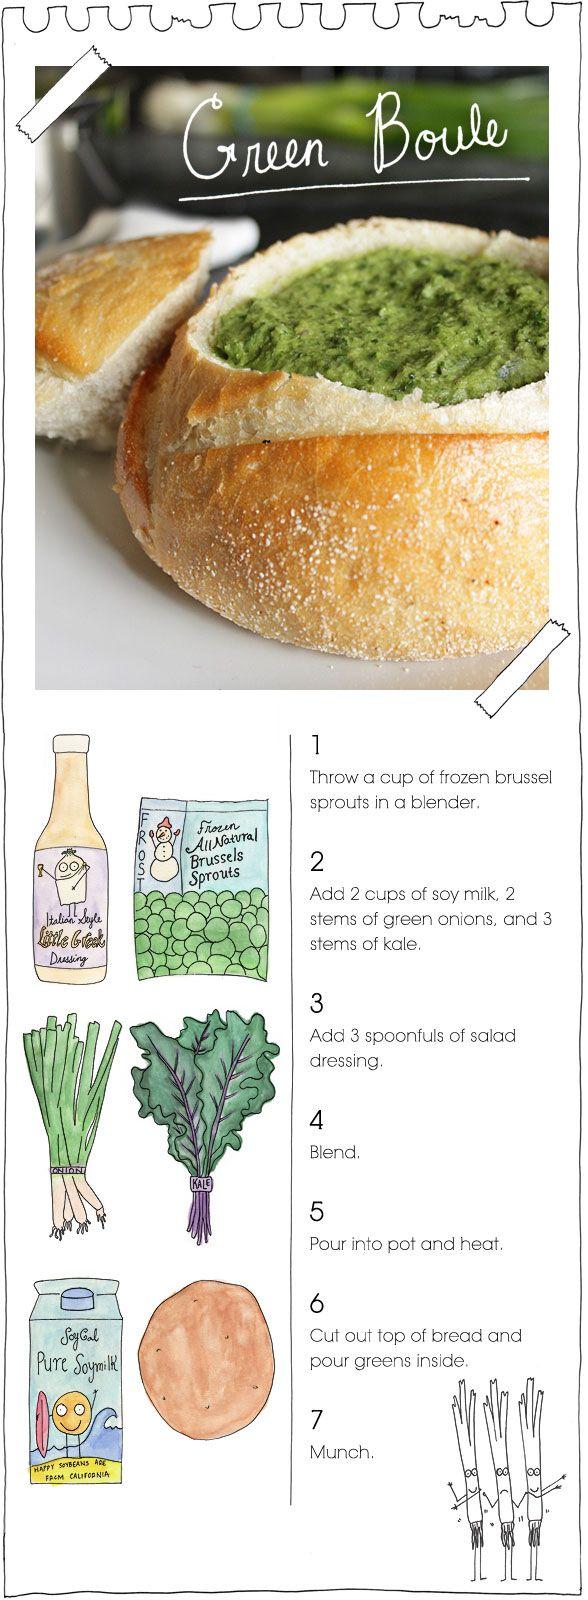 Green Boule: Vegans Stoner, Breads Bowls, Green Boul, Recipe, Brussels Sprouts, Diy Food, Vegan Stoner, Green Bowls, Dips